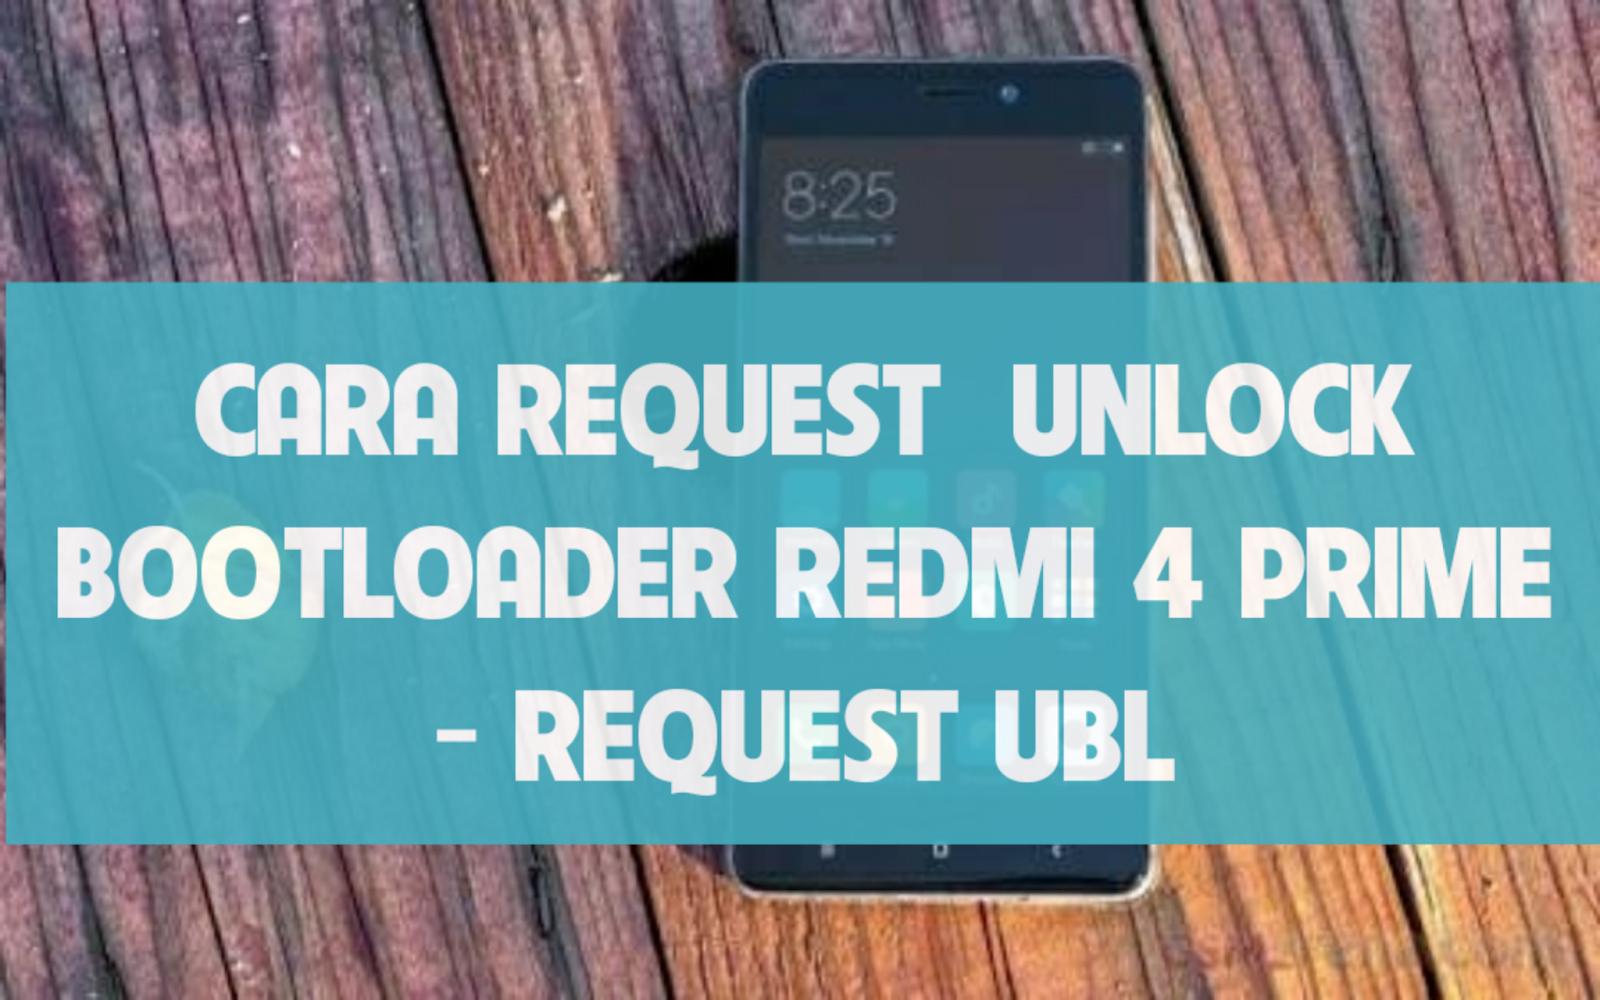 Cara Request UBL pada Redmi 4 Prime